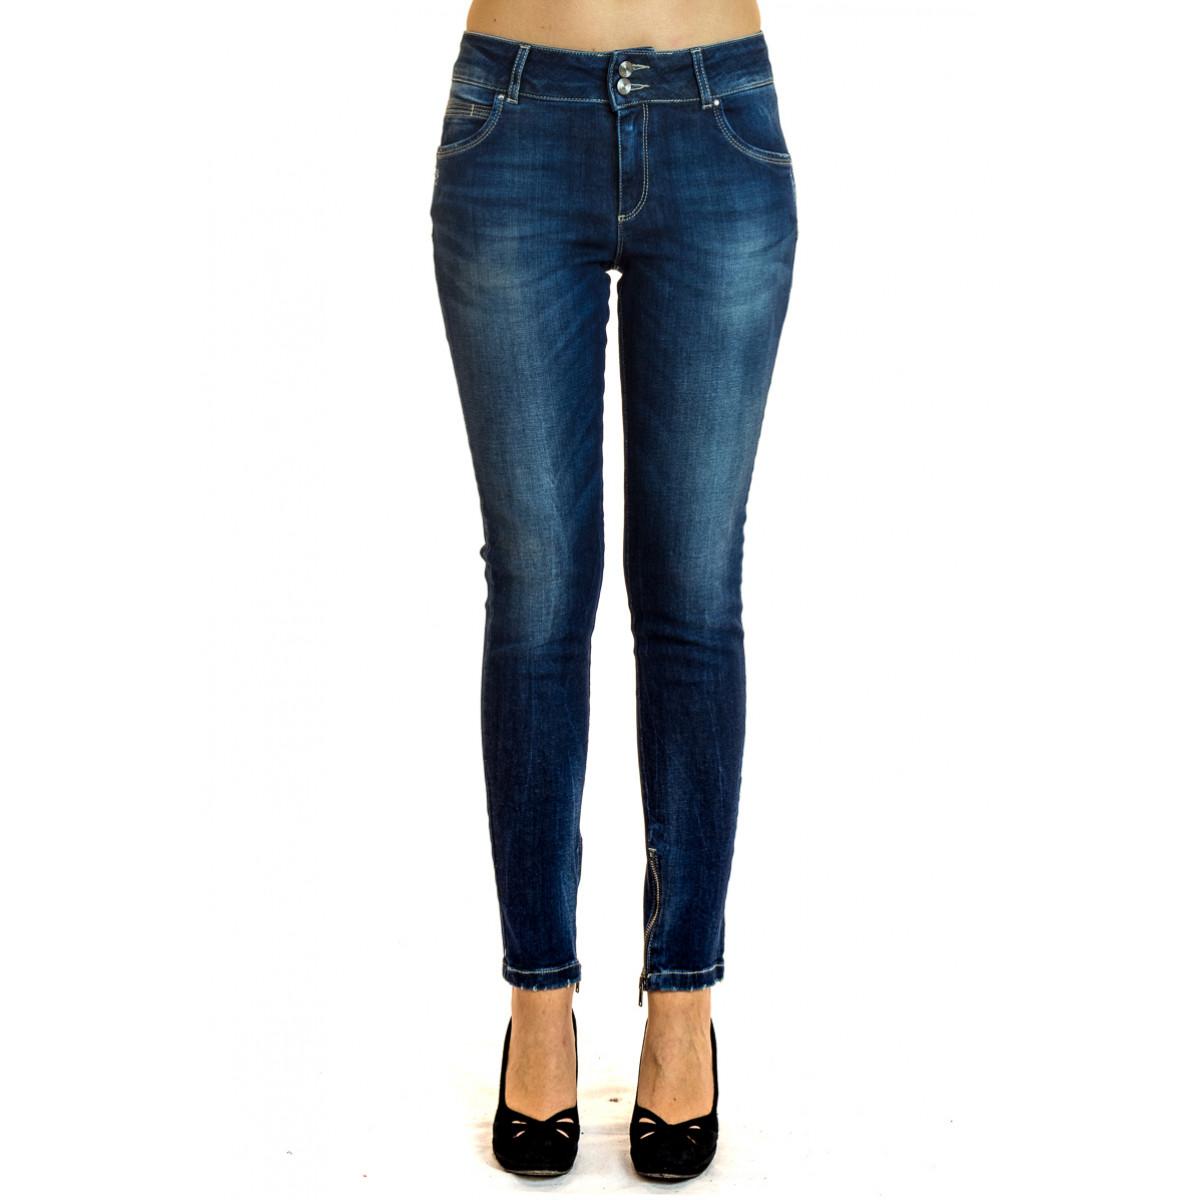 ae5eeaf09c10 KOCCA - Jeans push up - Jeans - WOMAN - Gruppo CAT Shop Online